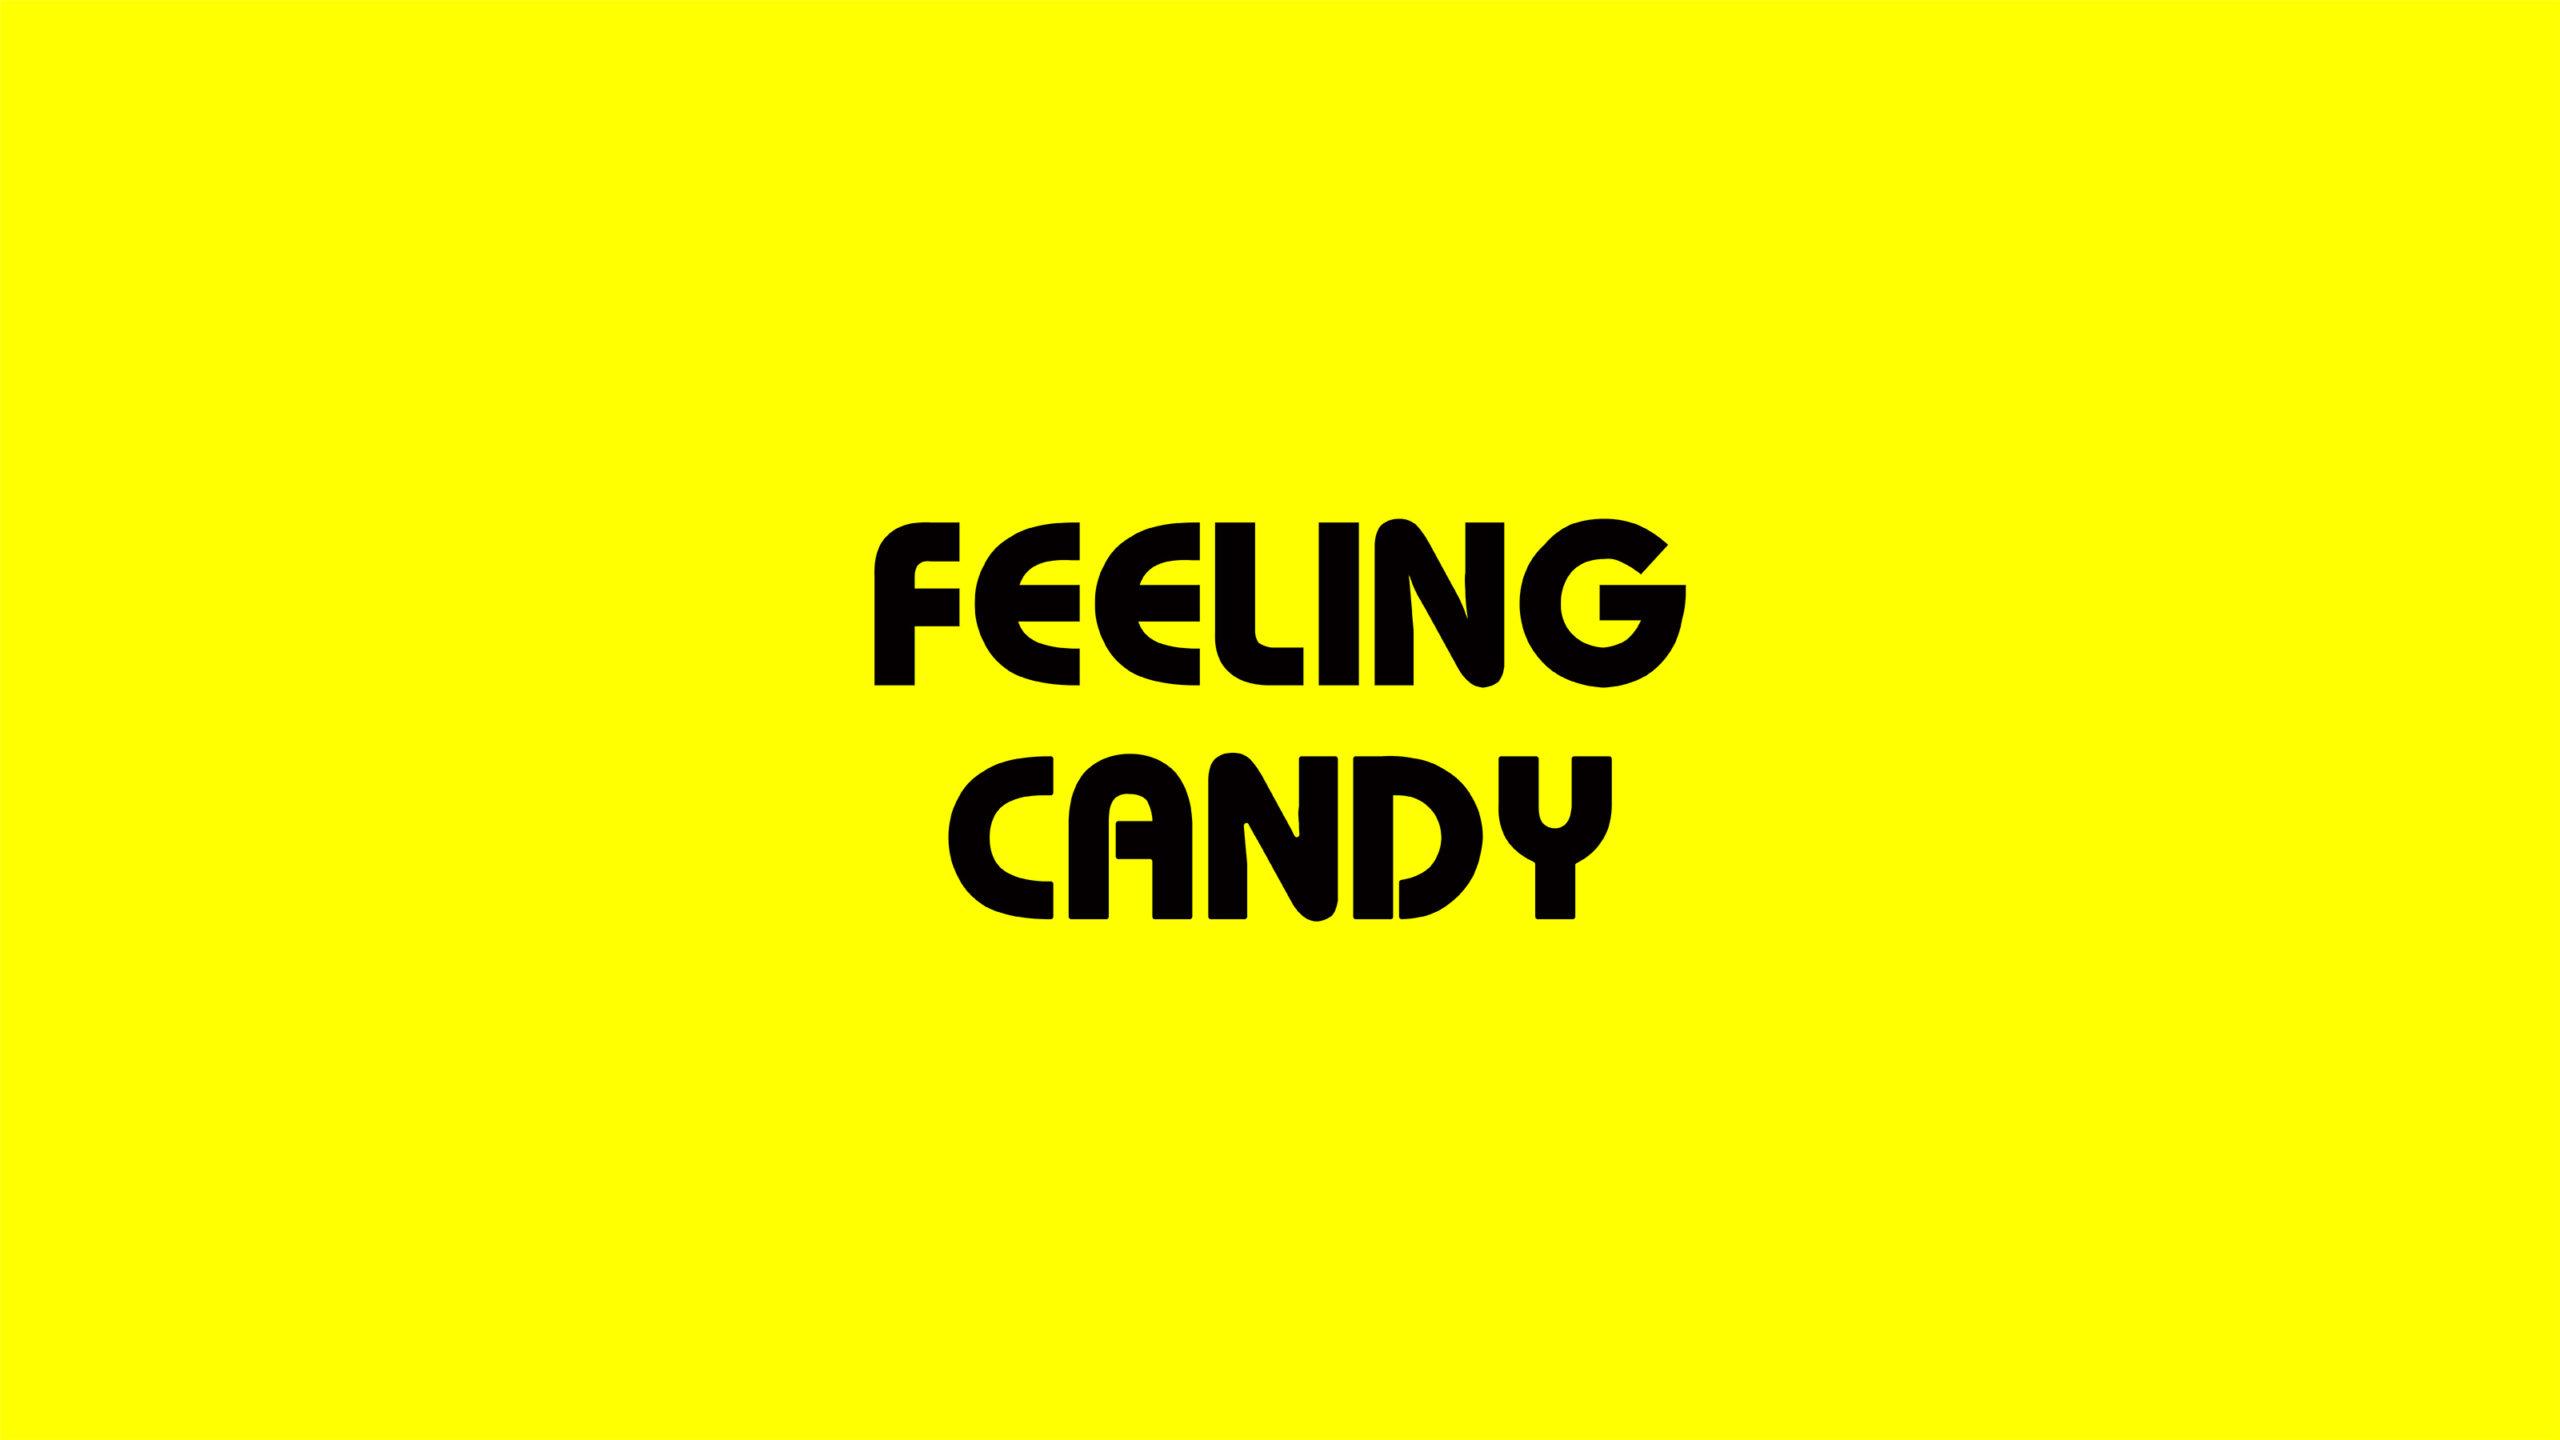 Feeling Candy